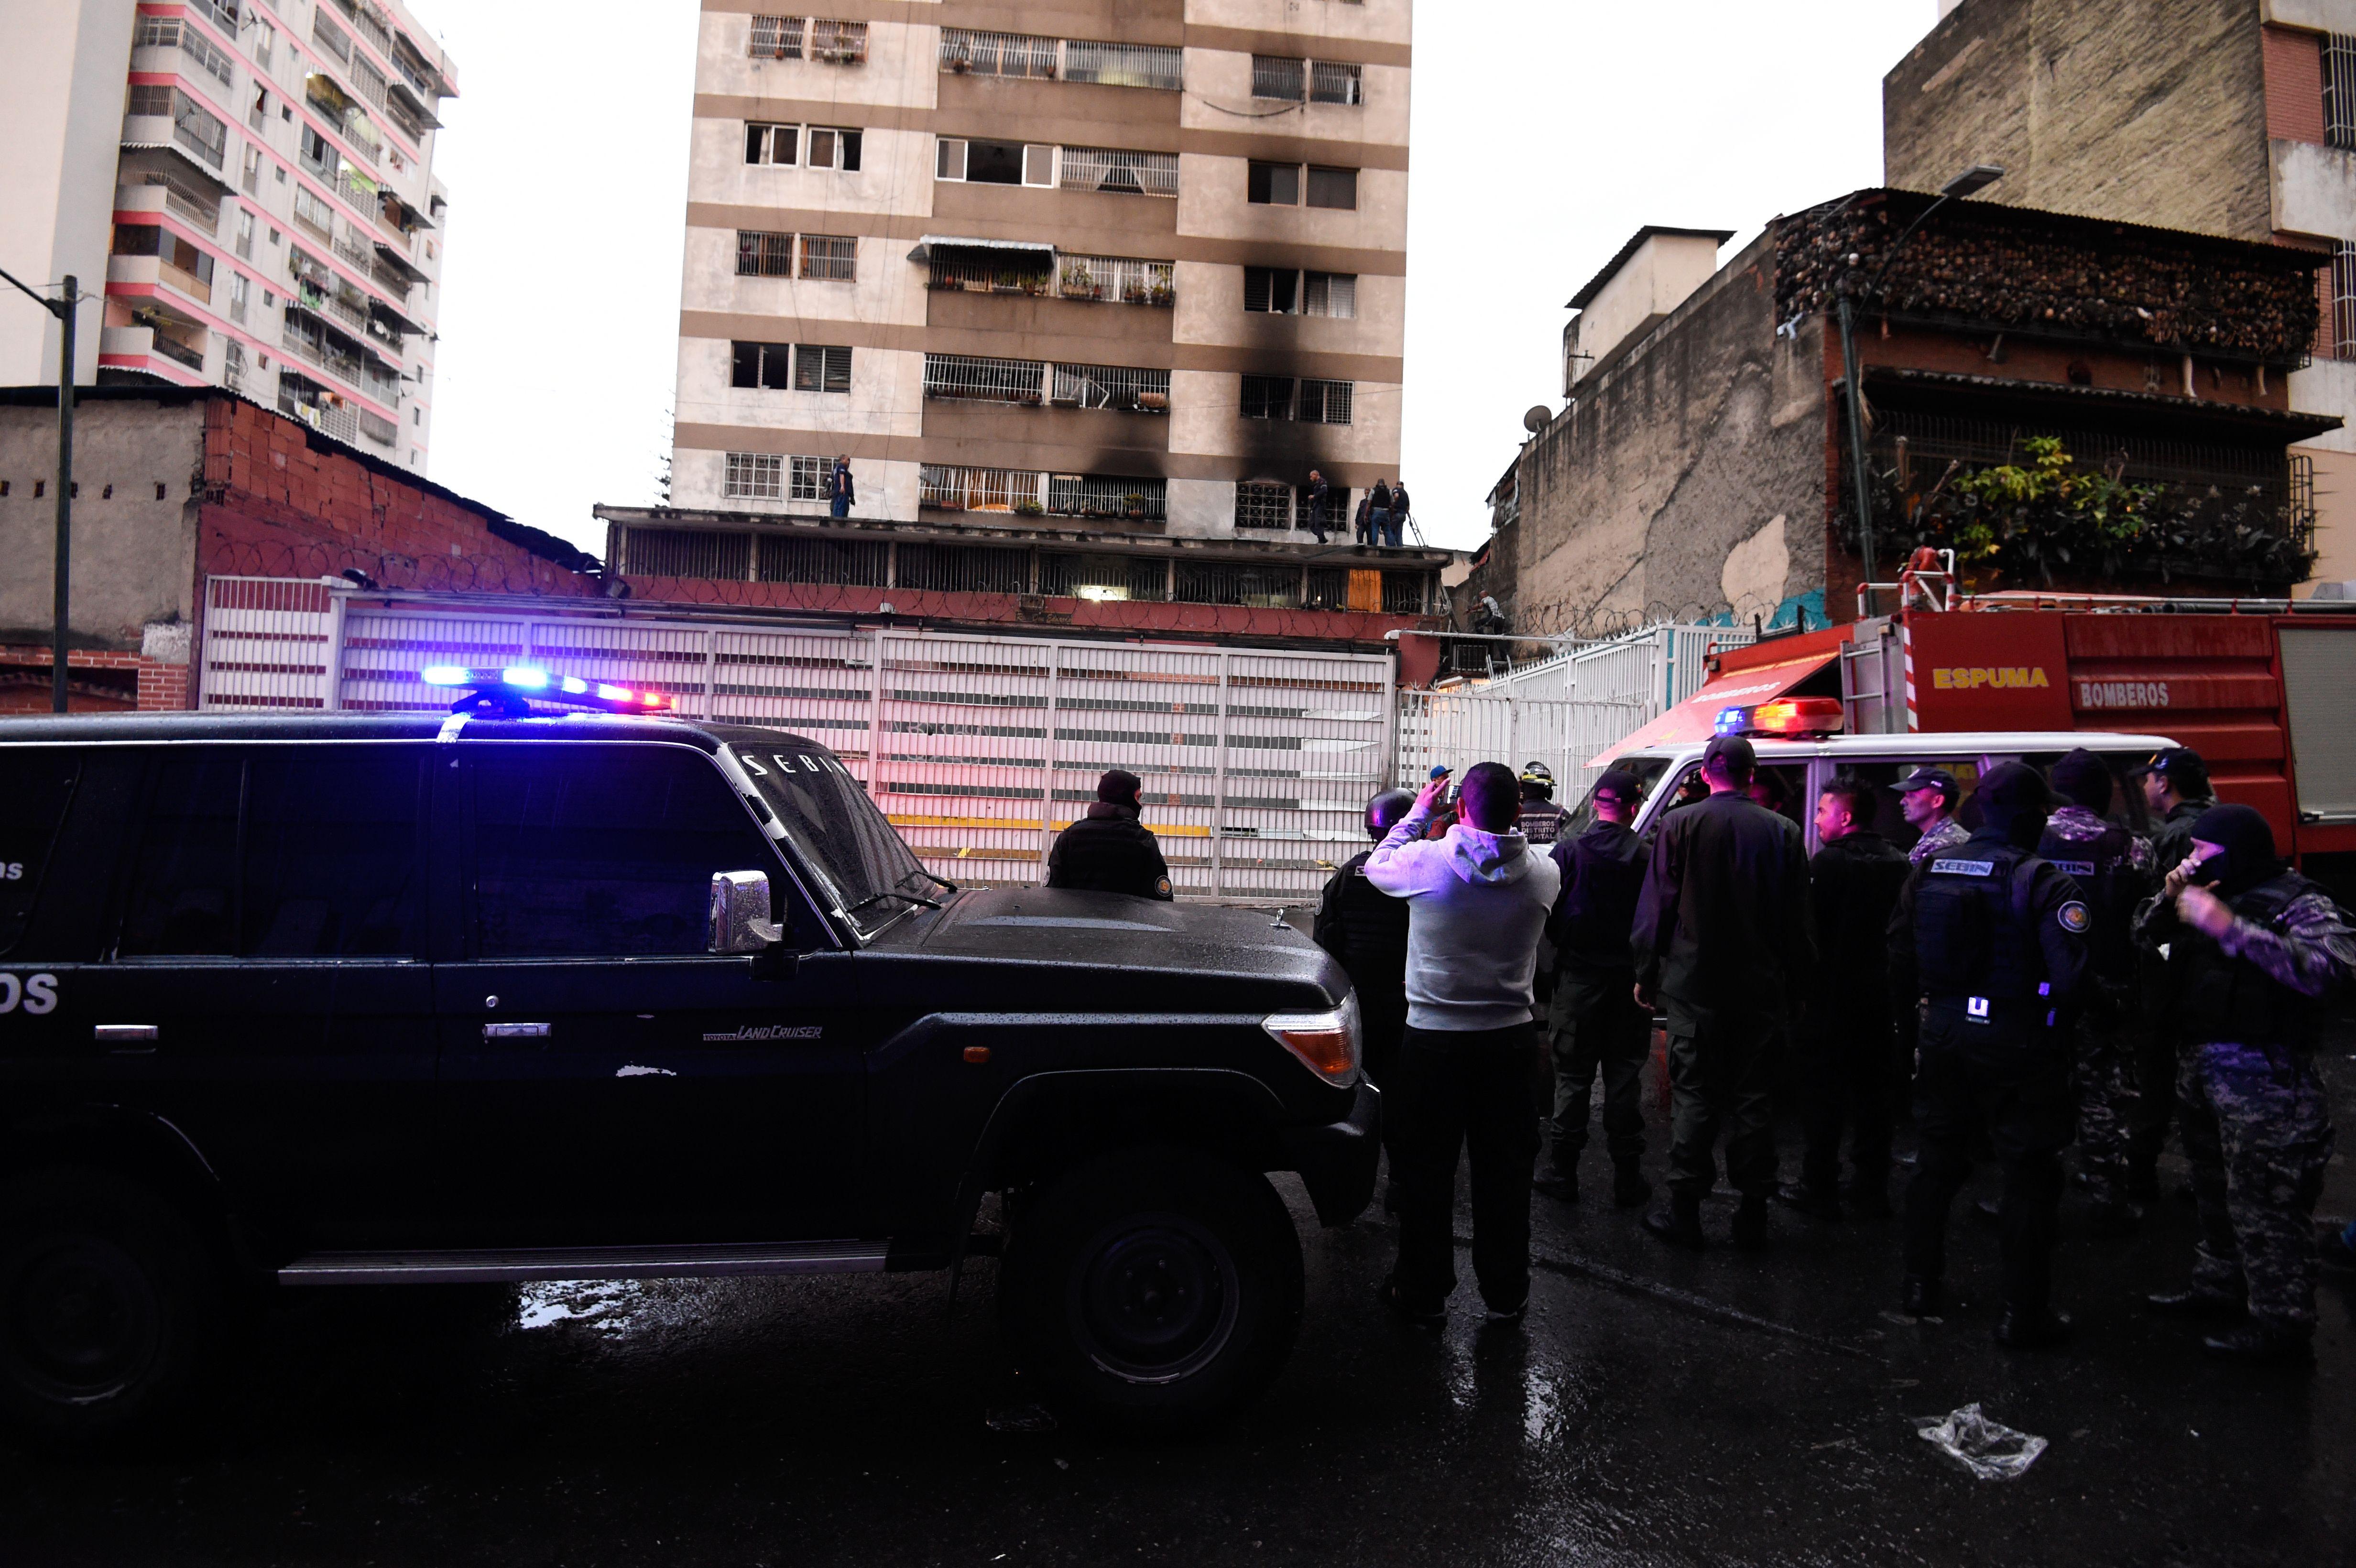 Nicolas maduro assassination scene